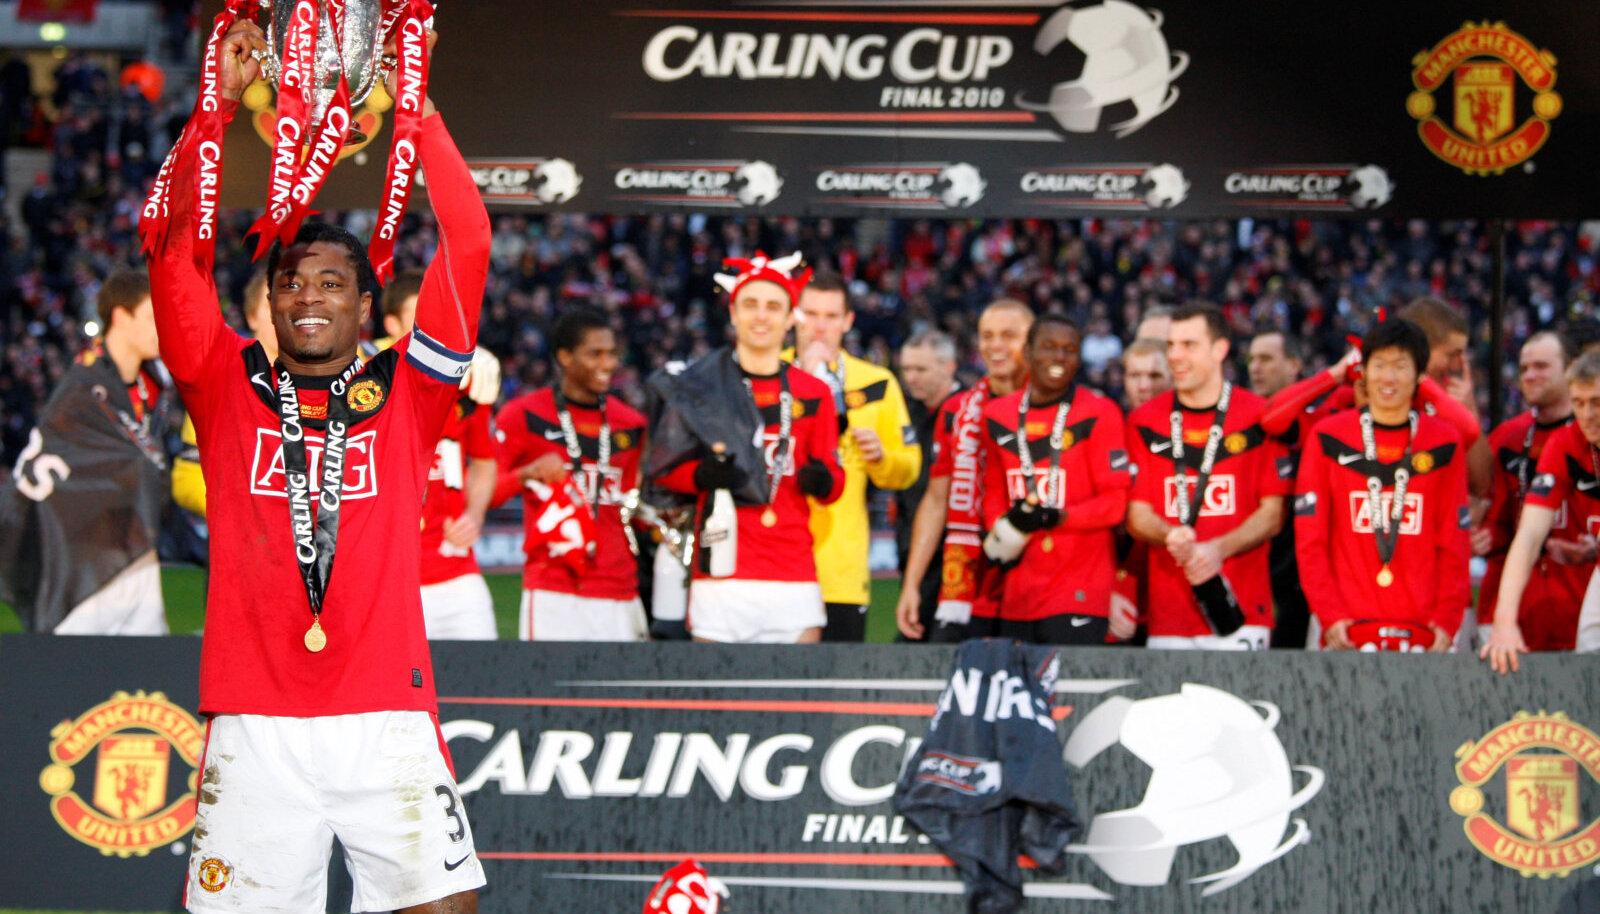 Patrice Evra Manchester Unitedi kaptenina liigakarikat pea kohale tõstmas